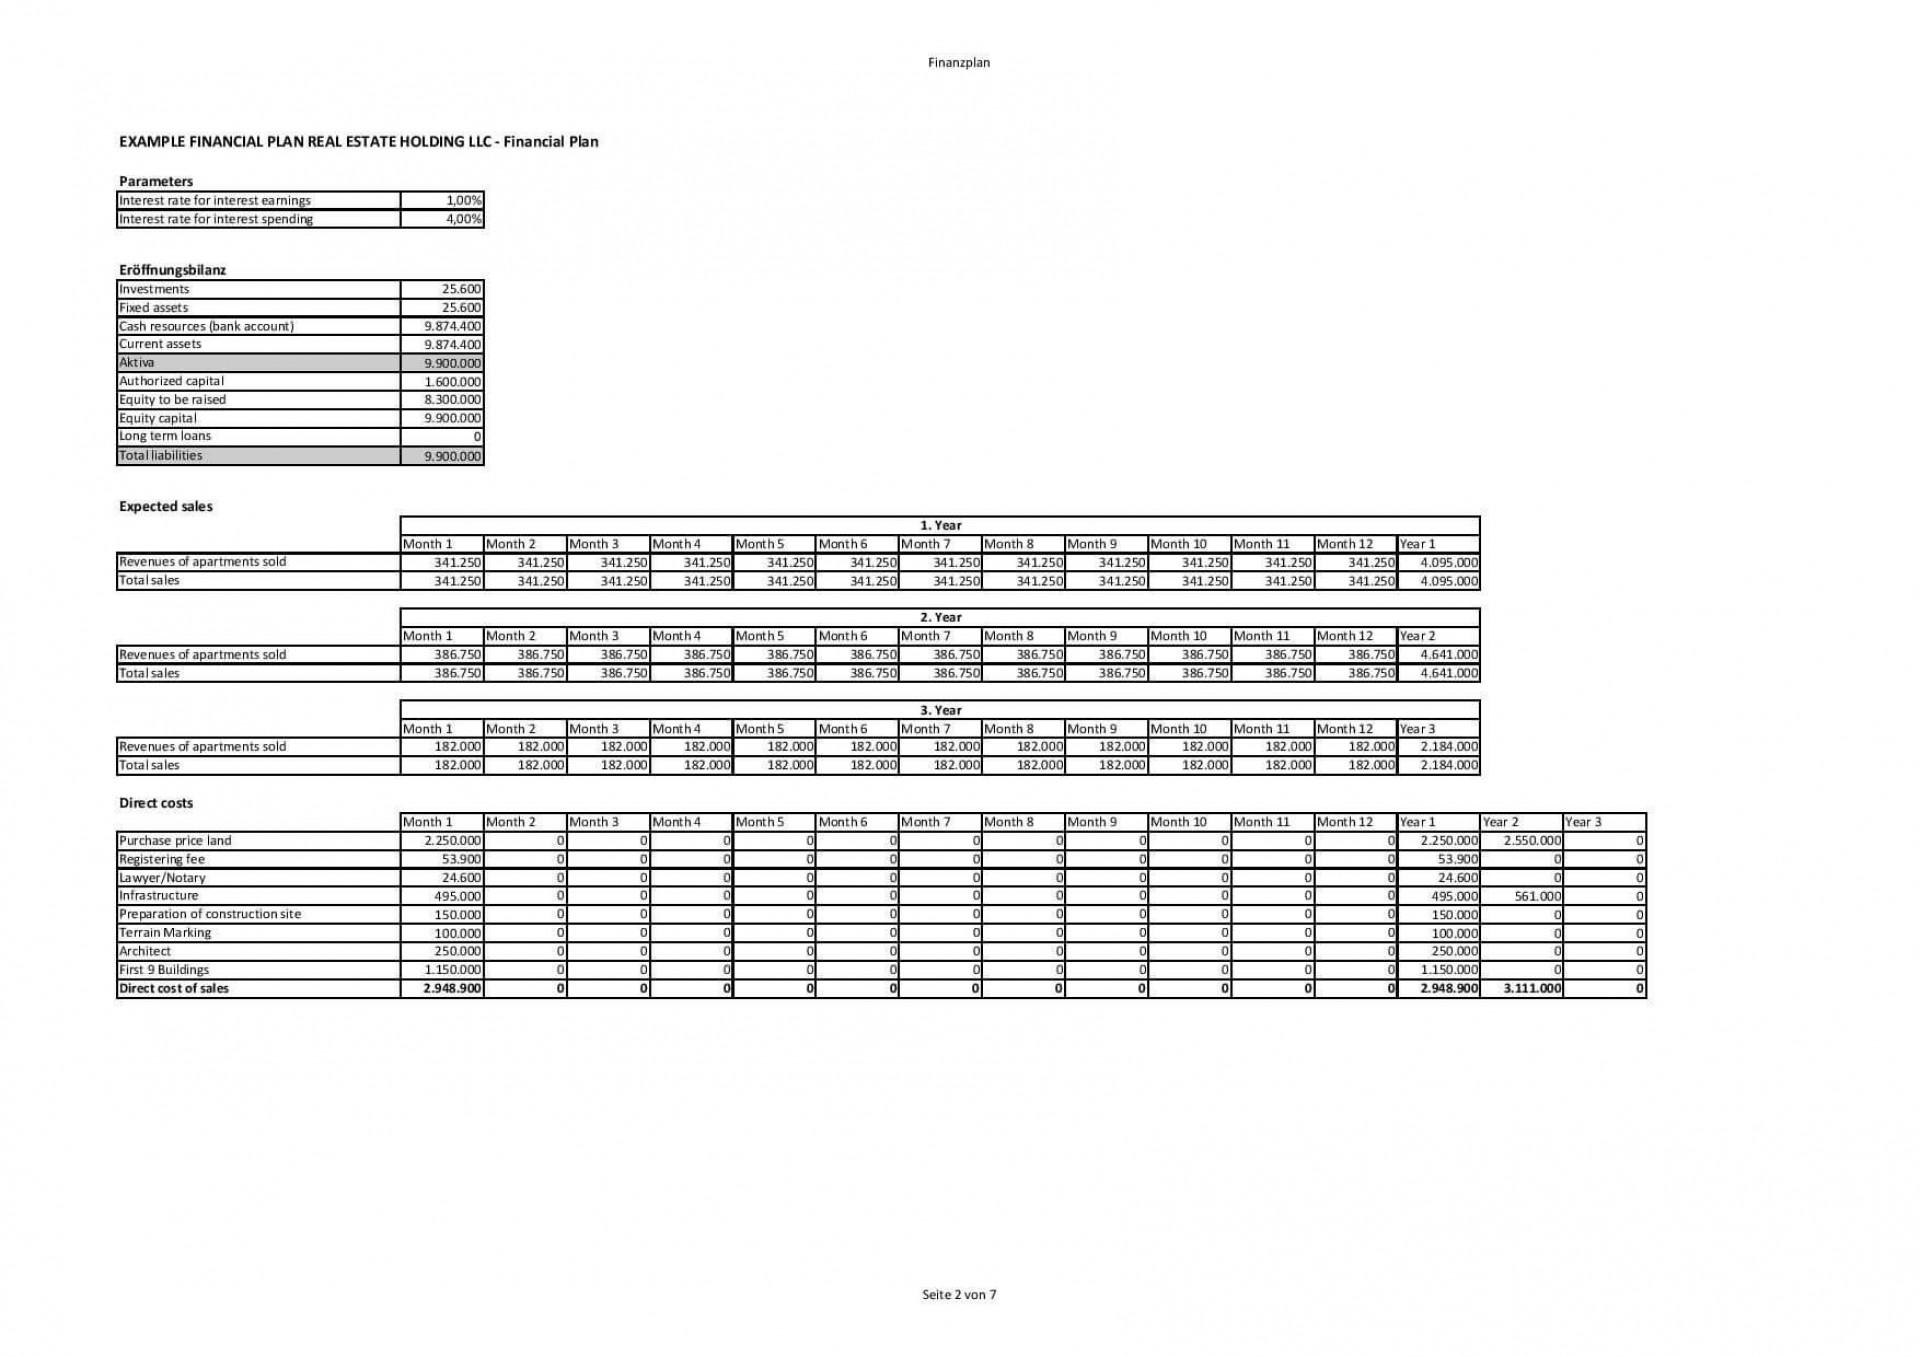 005 Unbelievable Financial Plan Template Excel High Definition  Strategic Busines Simple1920